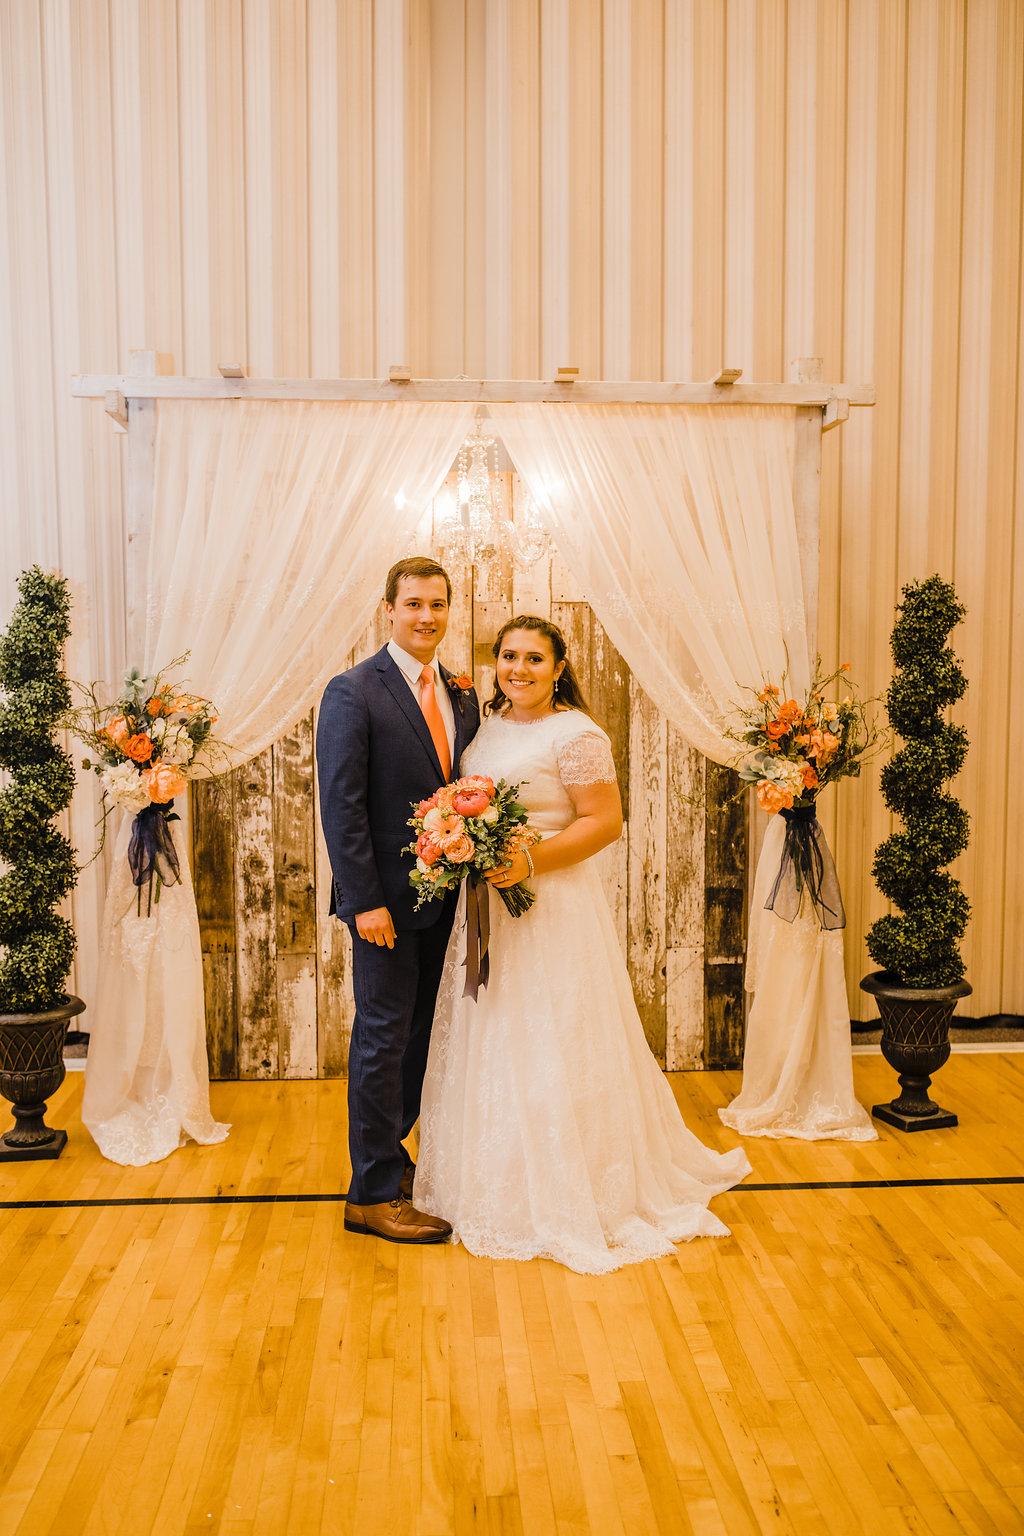 brigham city utah wedding photographer reception photos greet the bride and groom lds church reception